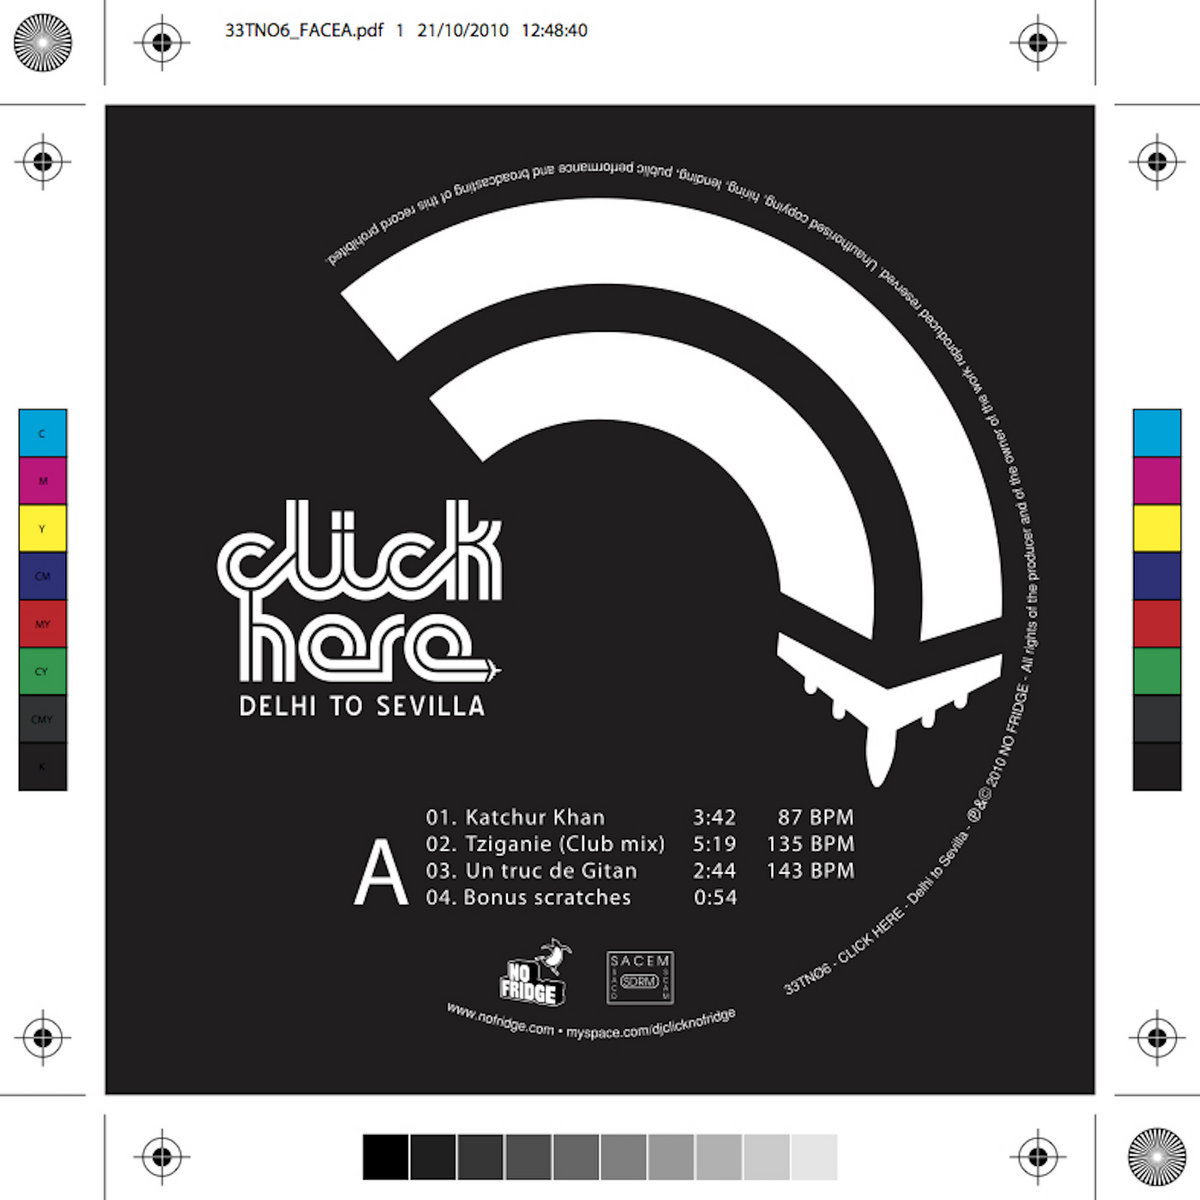 Delhi to Sevilla - LIMITED VINYL EP EDITION 6 tracks + bonus